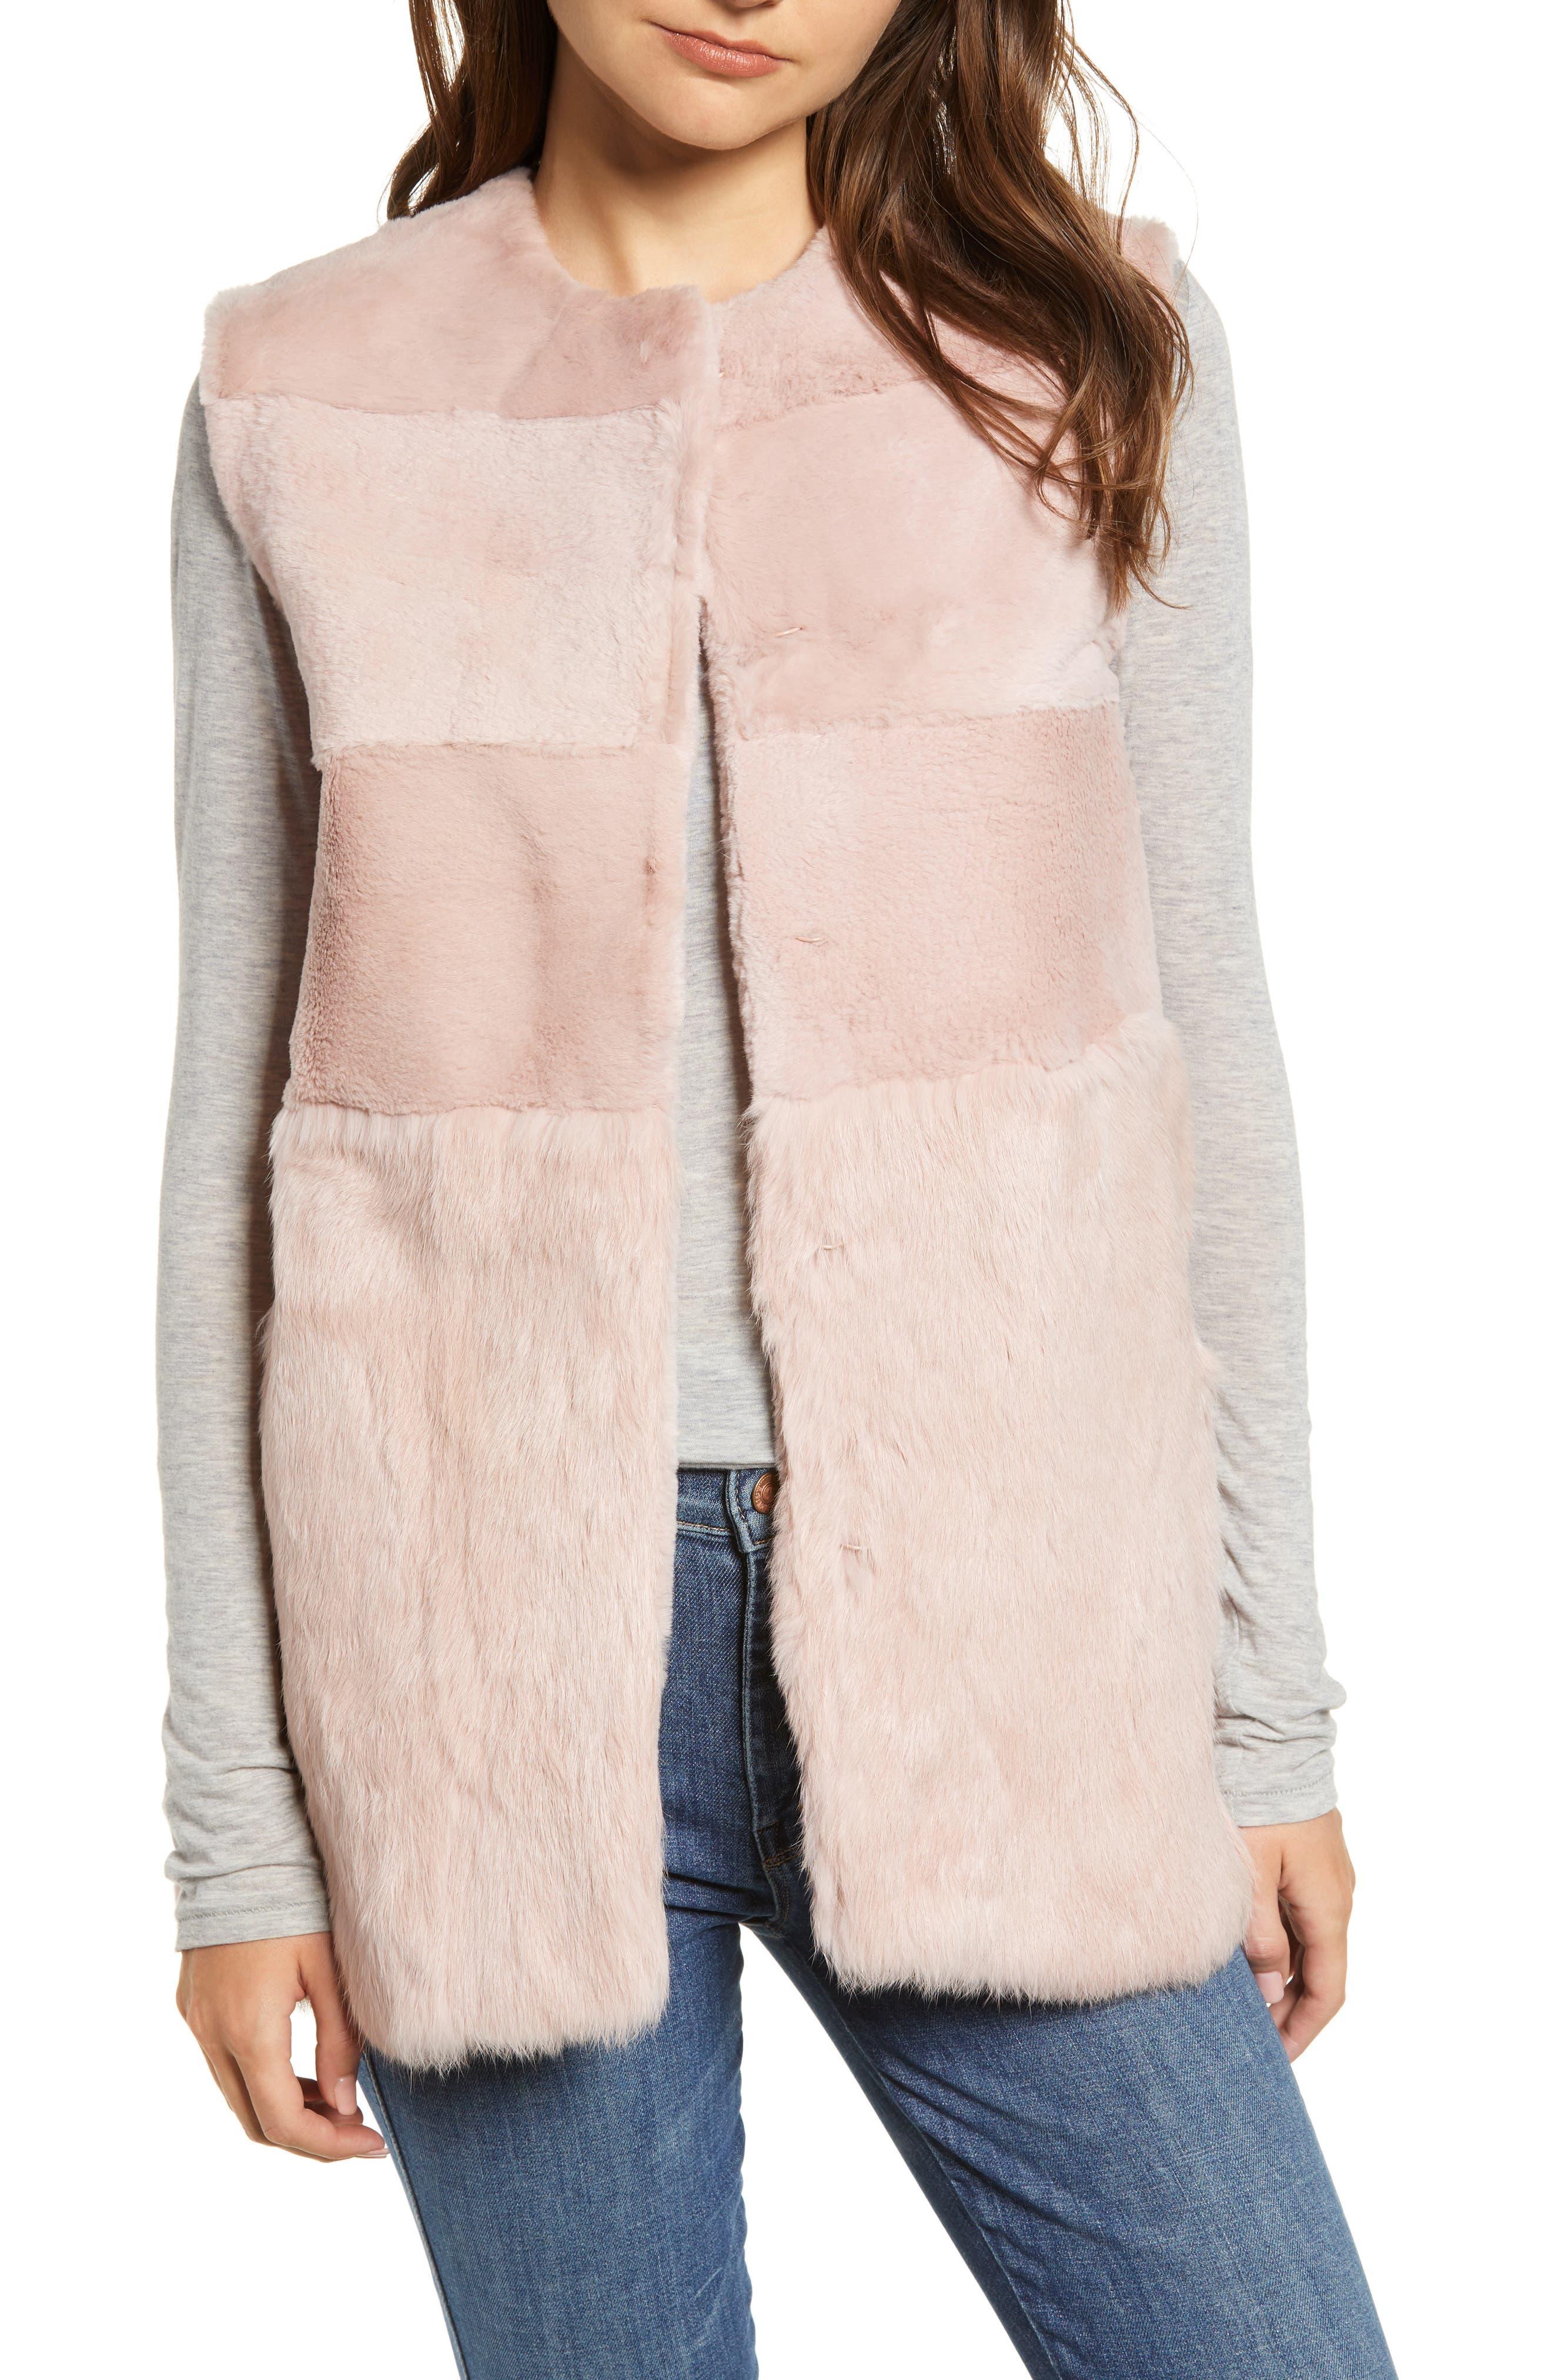 Collarless Genuine Rabbit Fur Vest,                             Main thumbnail 1, color,                             695